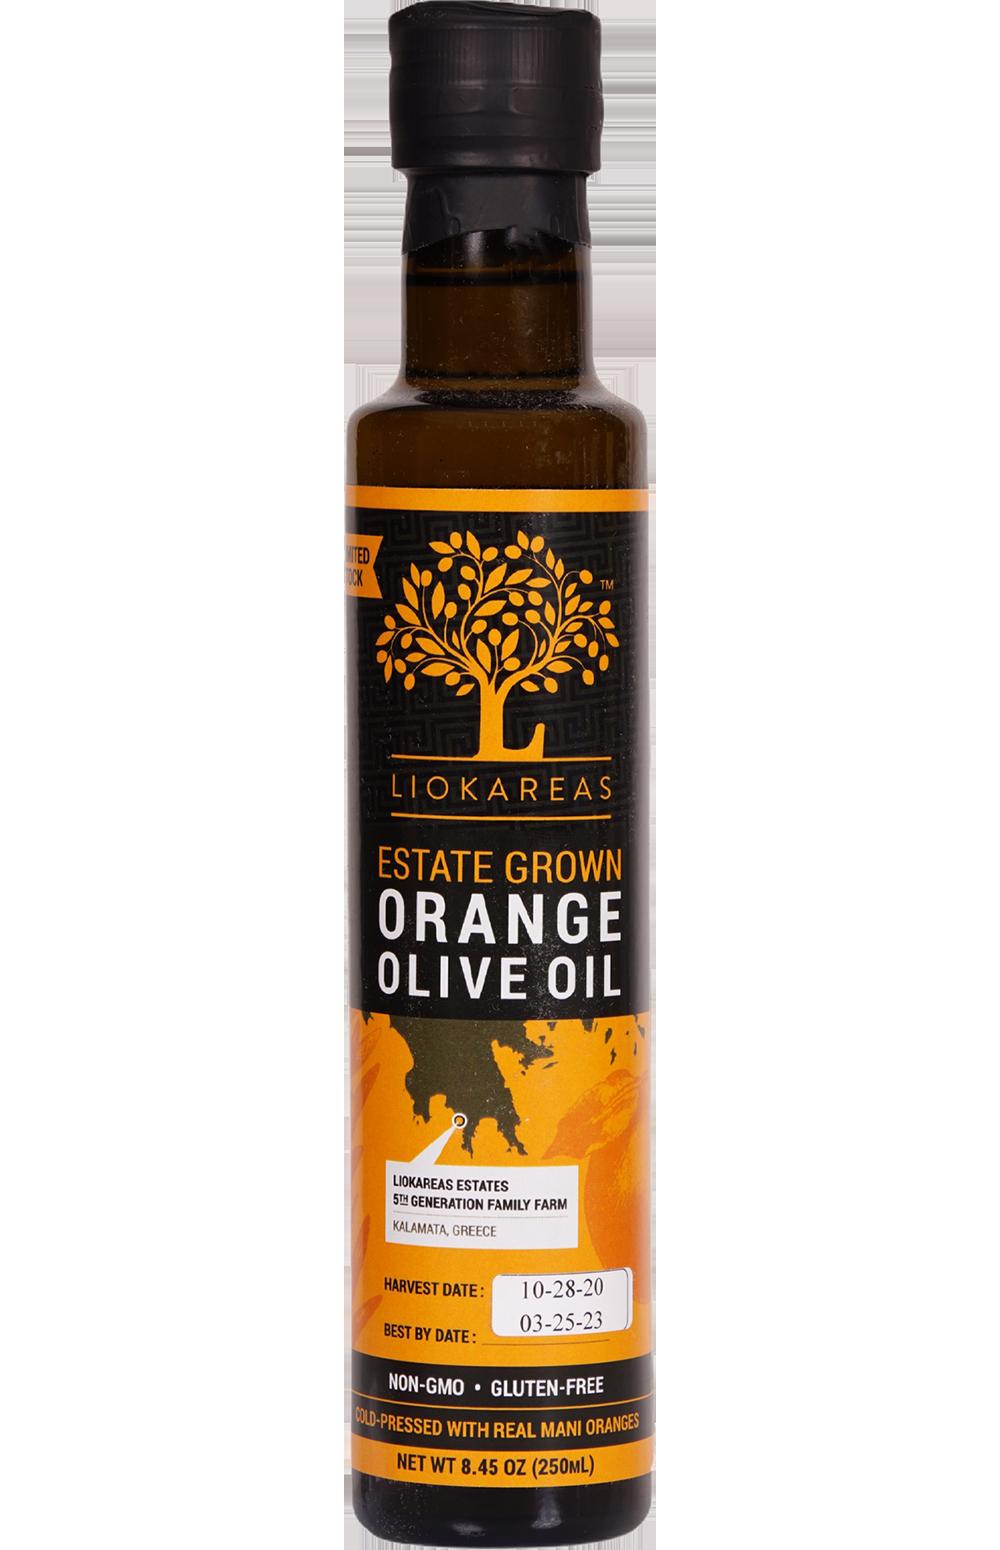 Liokareas Estate Grown Orange